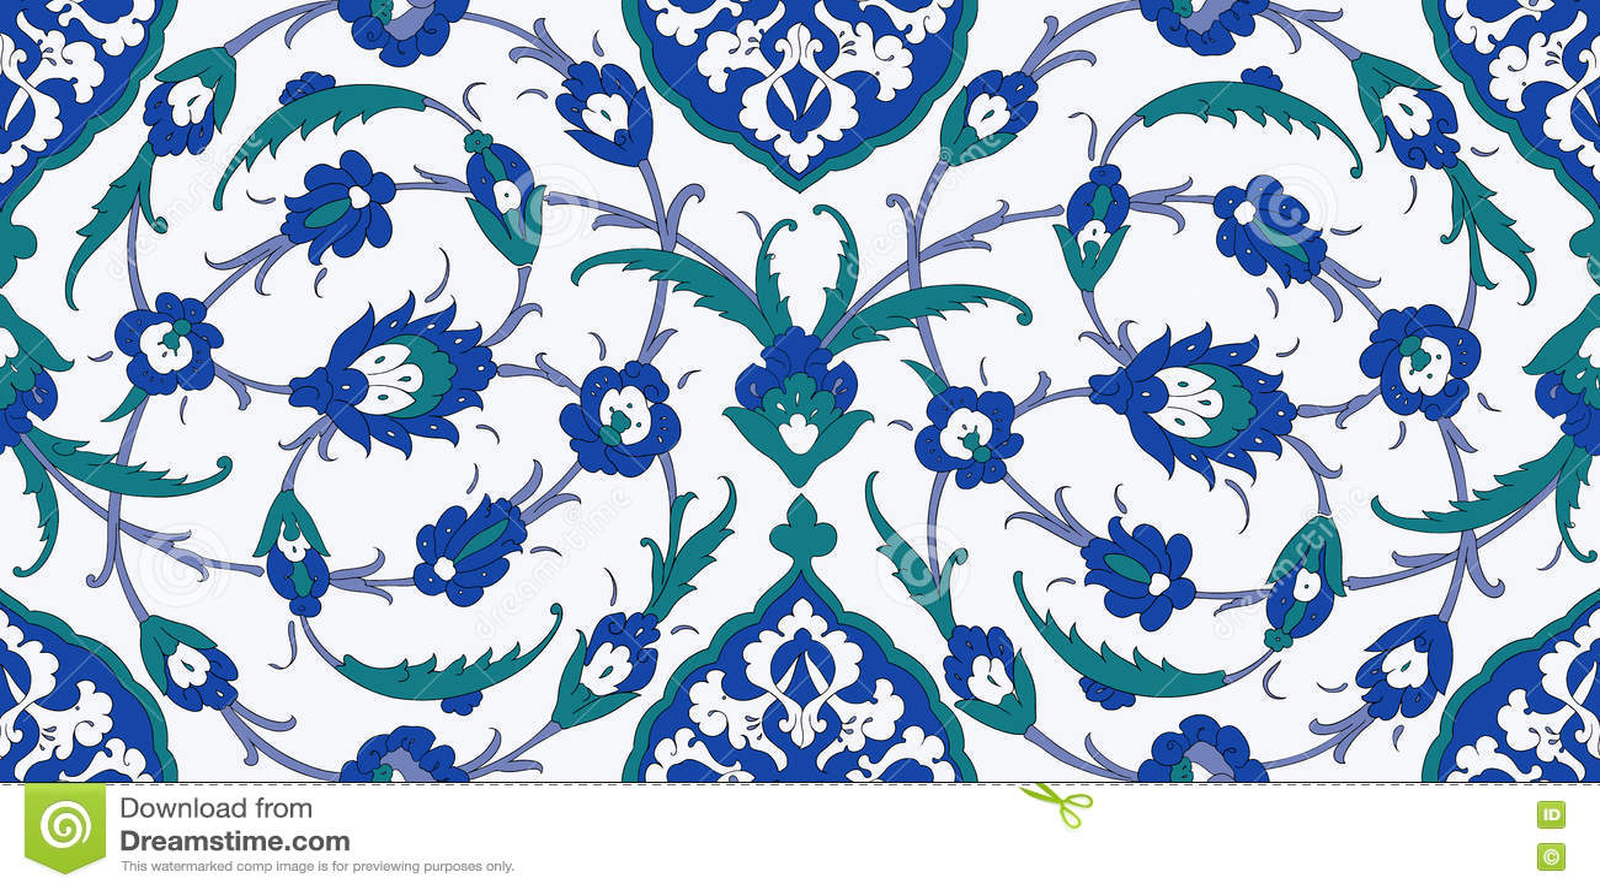 Floral ornamental seamless pattern for interior decoration and graphic design. Desktop wallpaper. Background. Iznik. Vector.